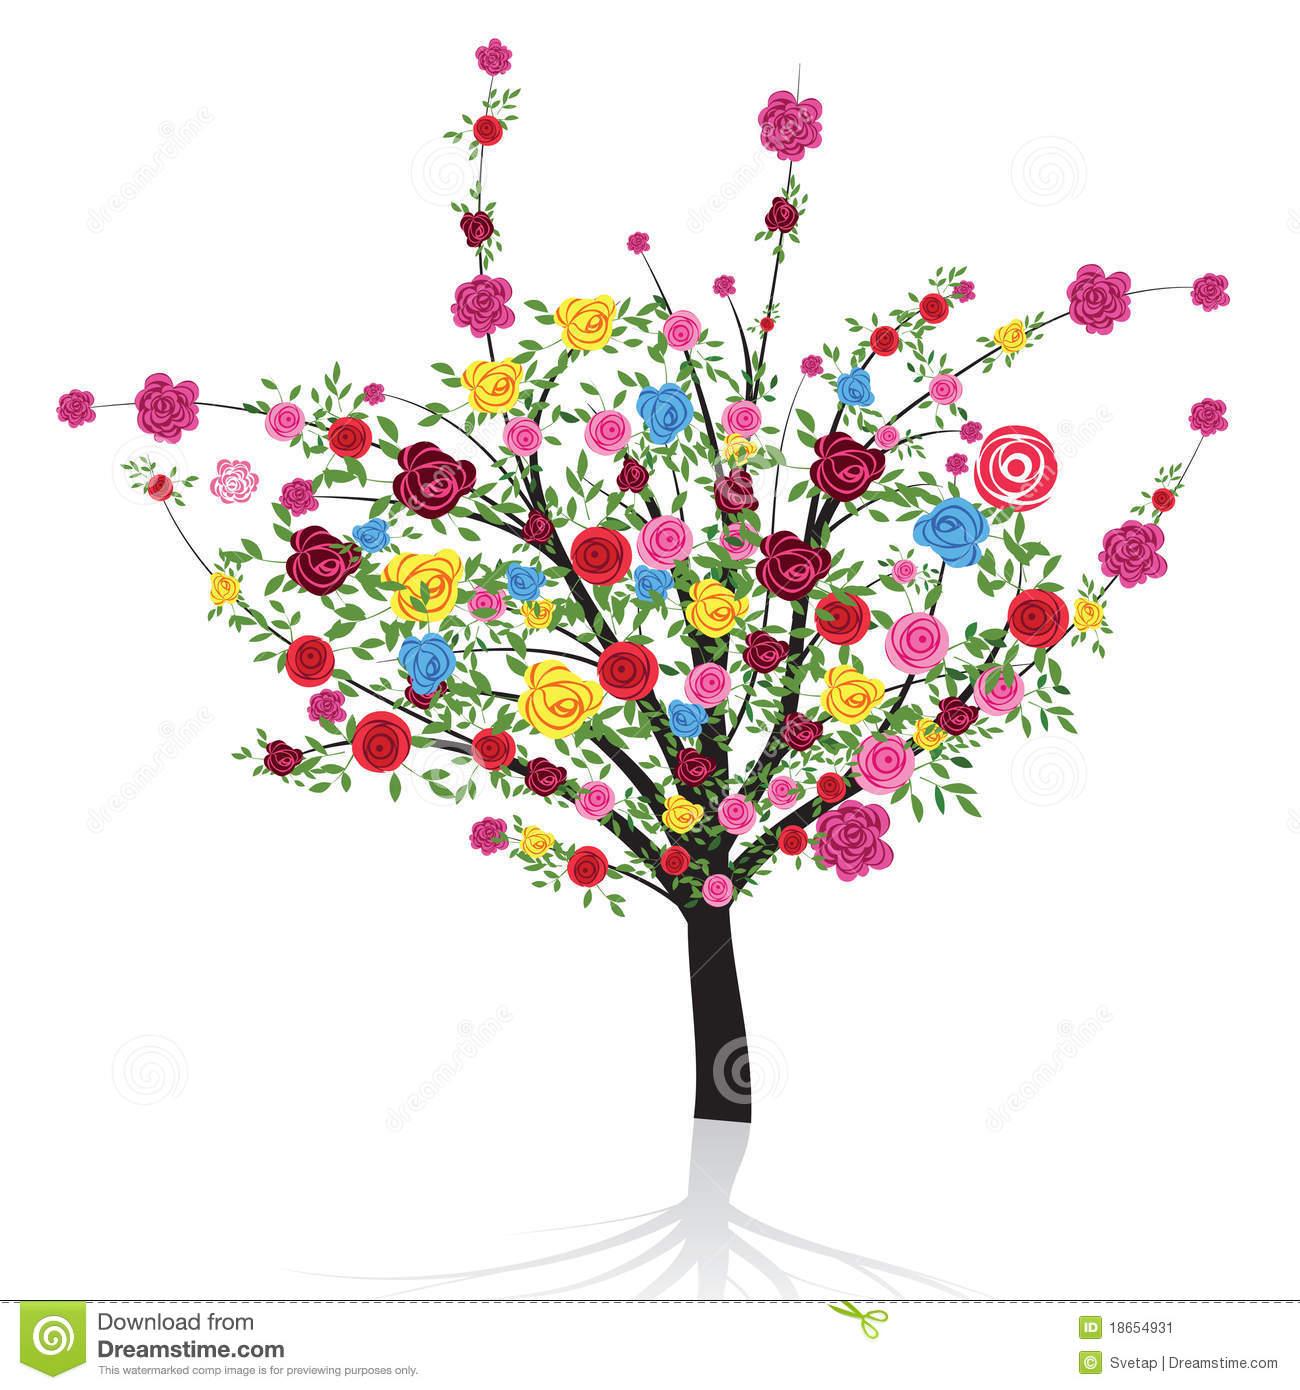 flowering tree clipart - photo #34